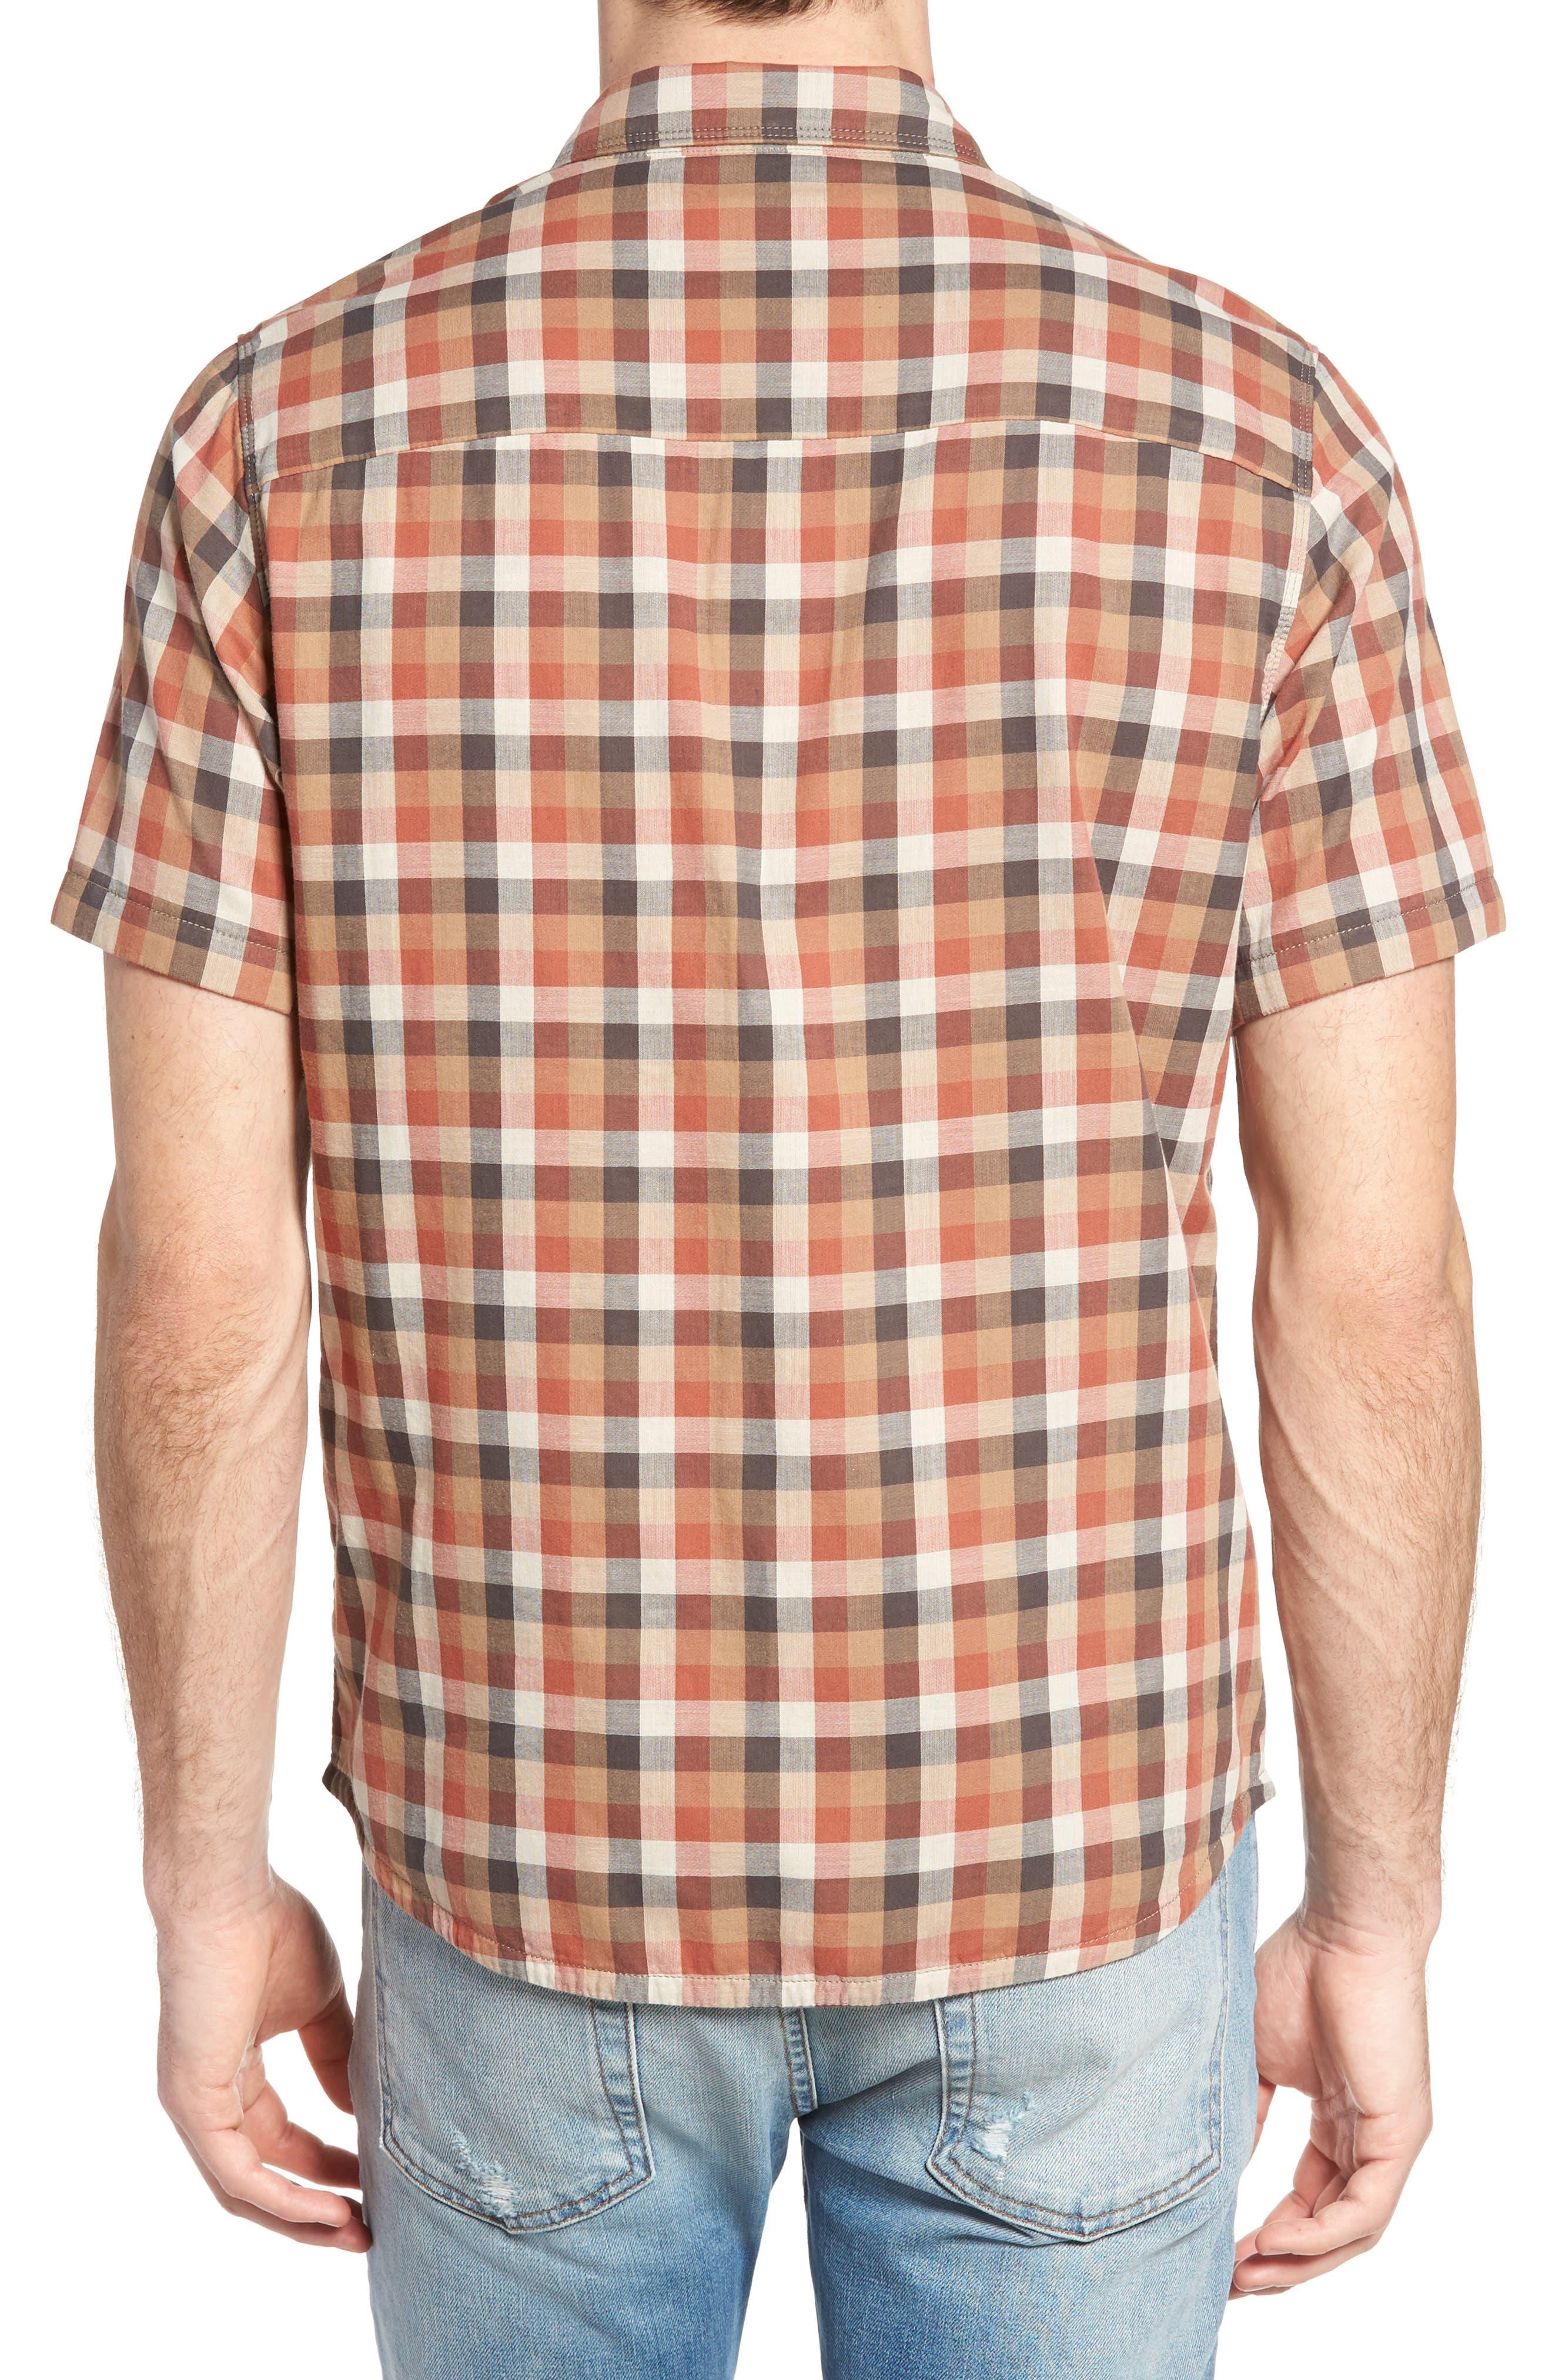 Nomad Reversible Plaid Sport Shirt,                             Alternate thumbnail 2, color,                             907